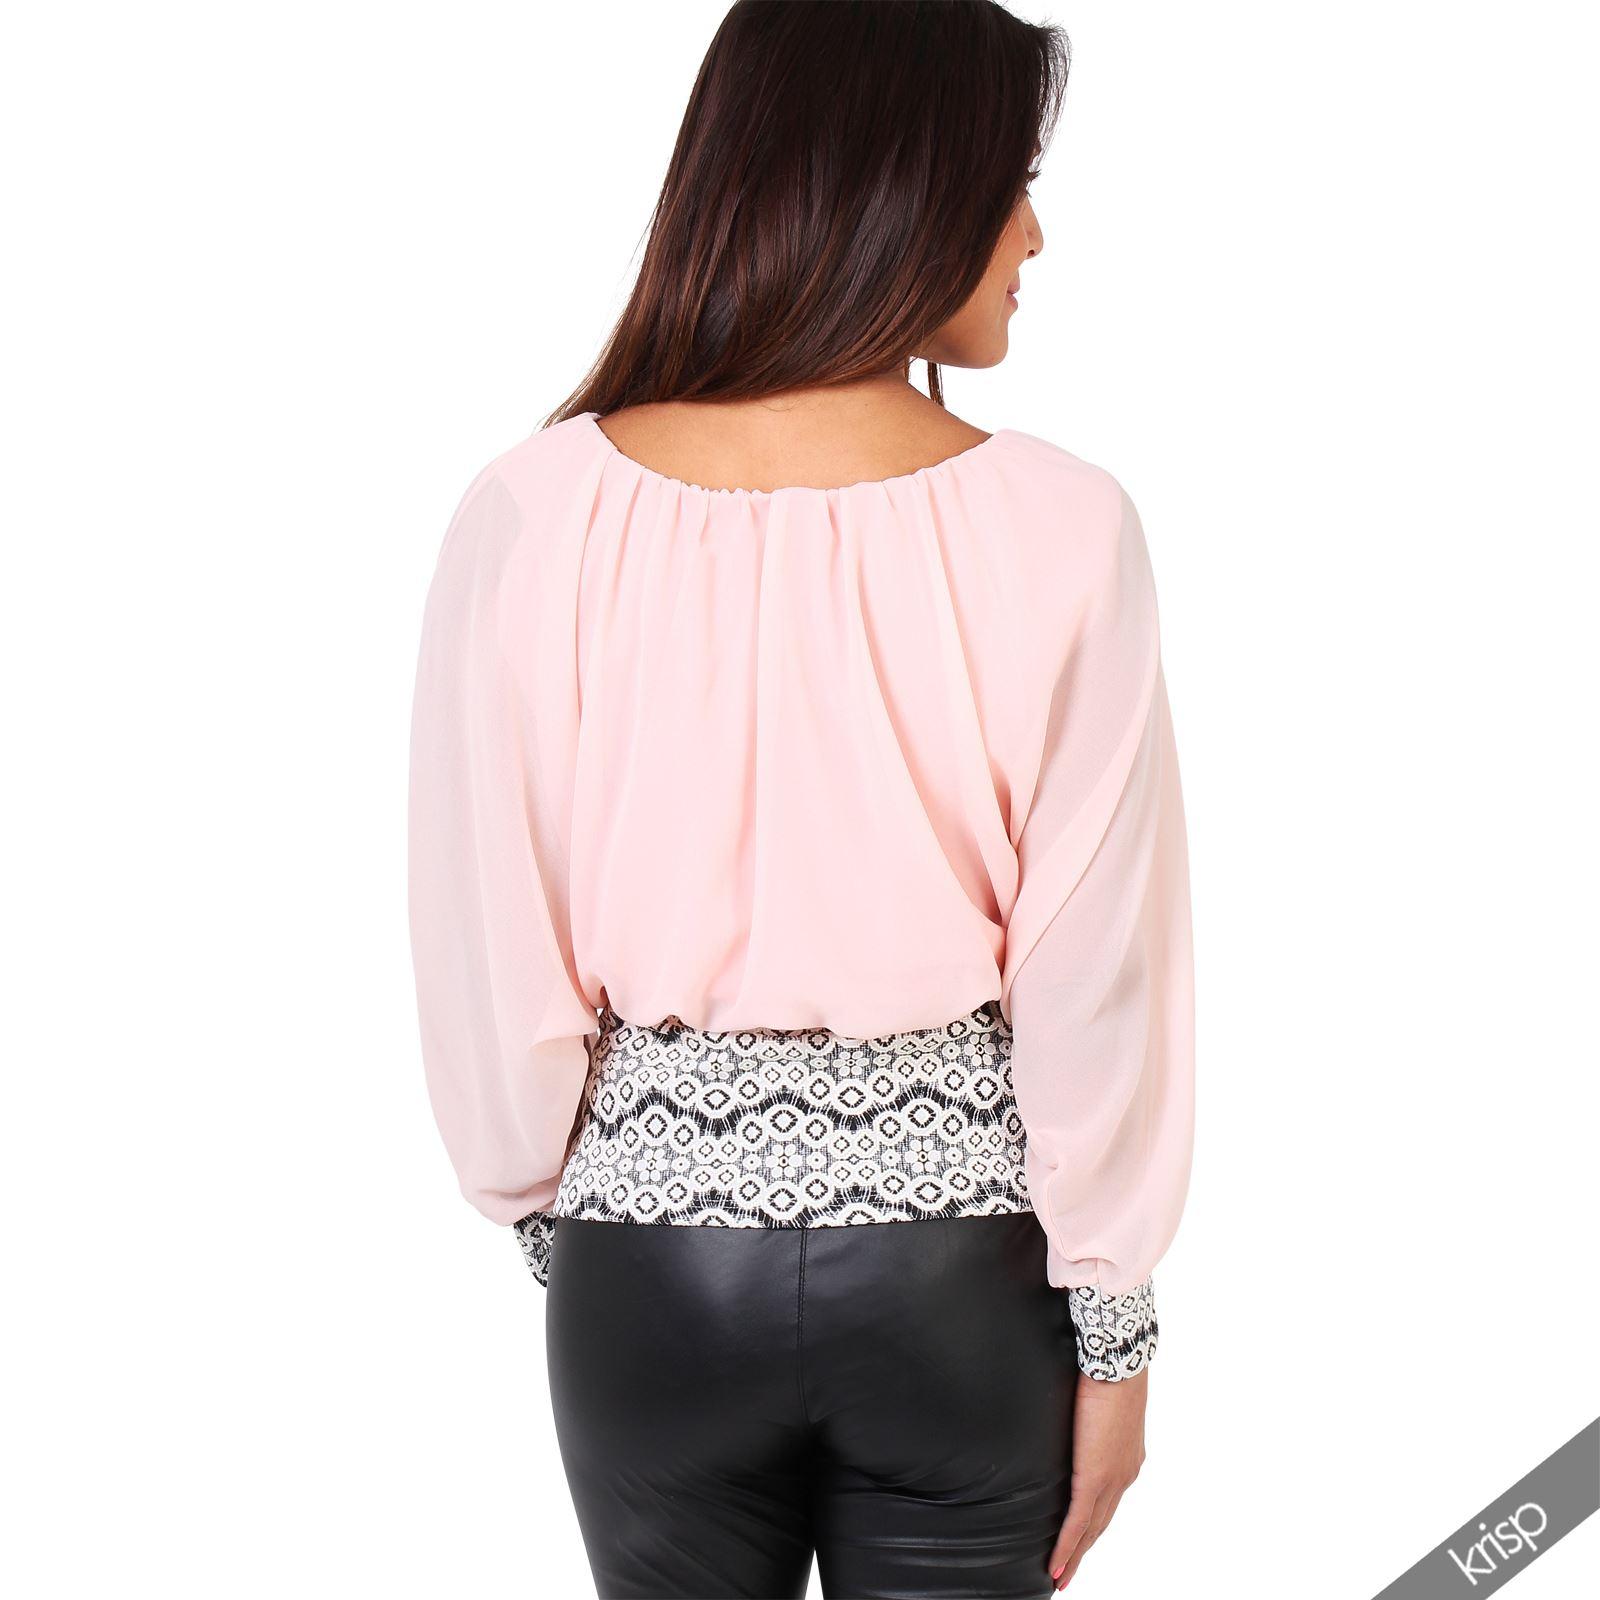 femme top haut blouse contraste mousseline piss glamour sexy ebay. Black Bedroom Furniture Sets. Home Design Ideas